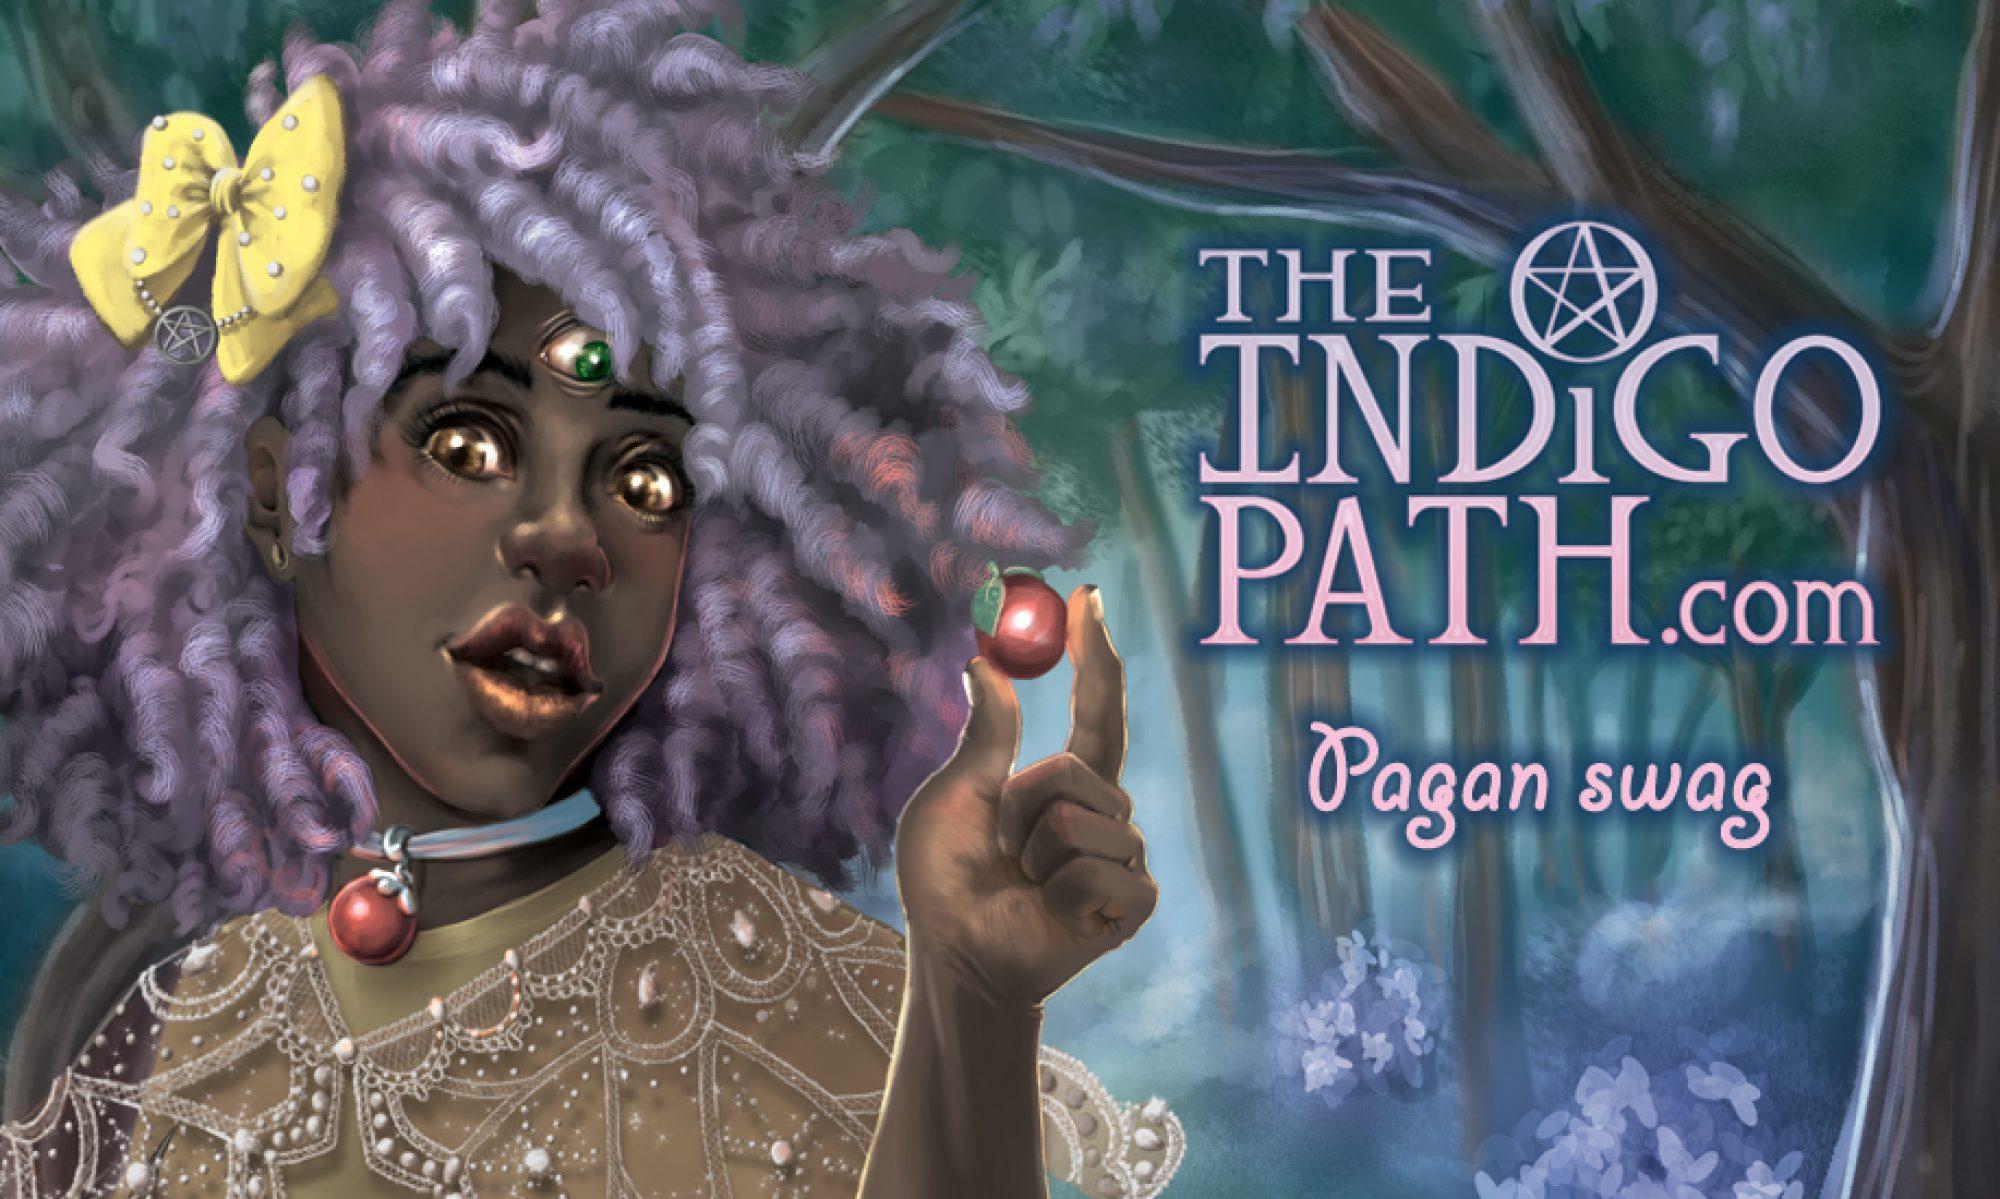 The Indigo Path